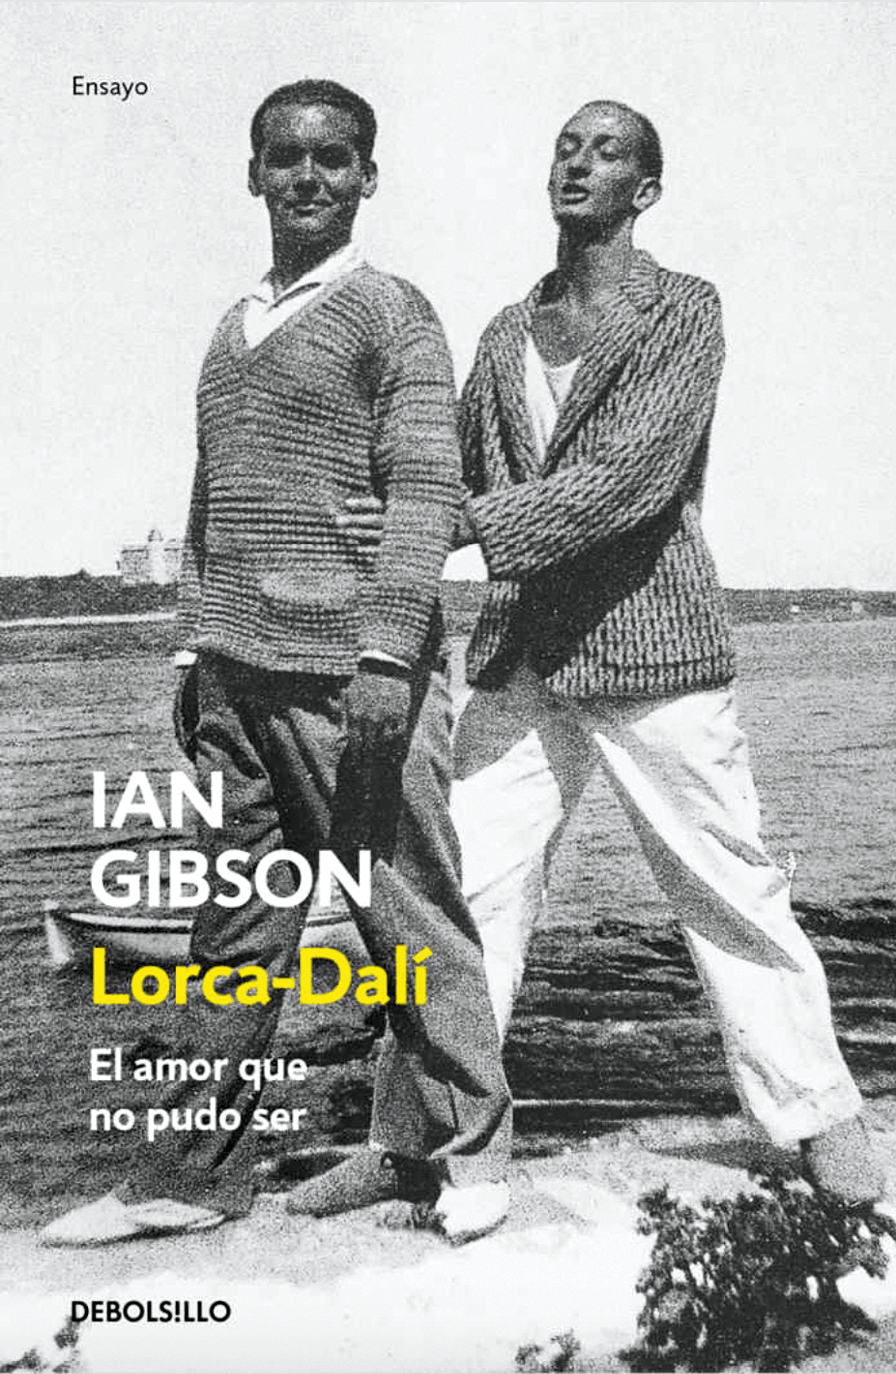 Ian Gibson, Lorca-Dalí. El amor que no pudo ser, 2016